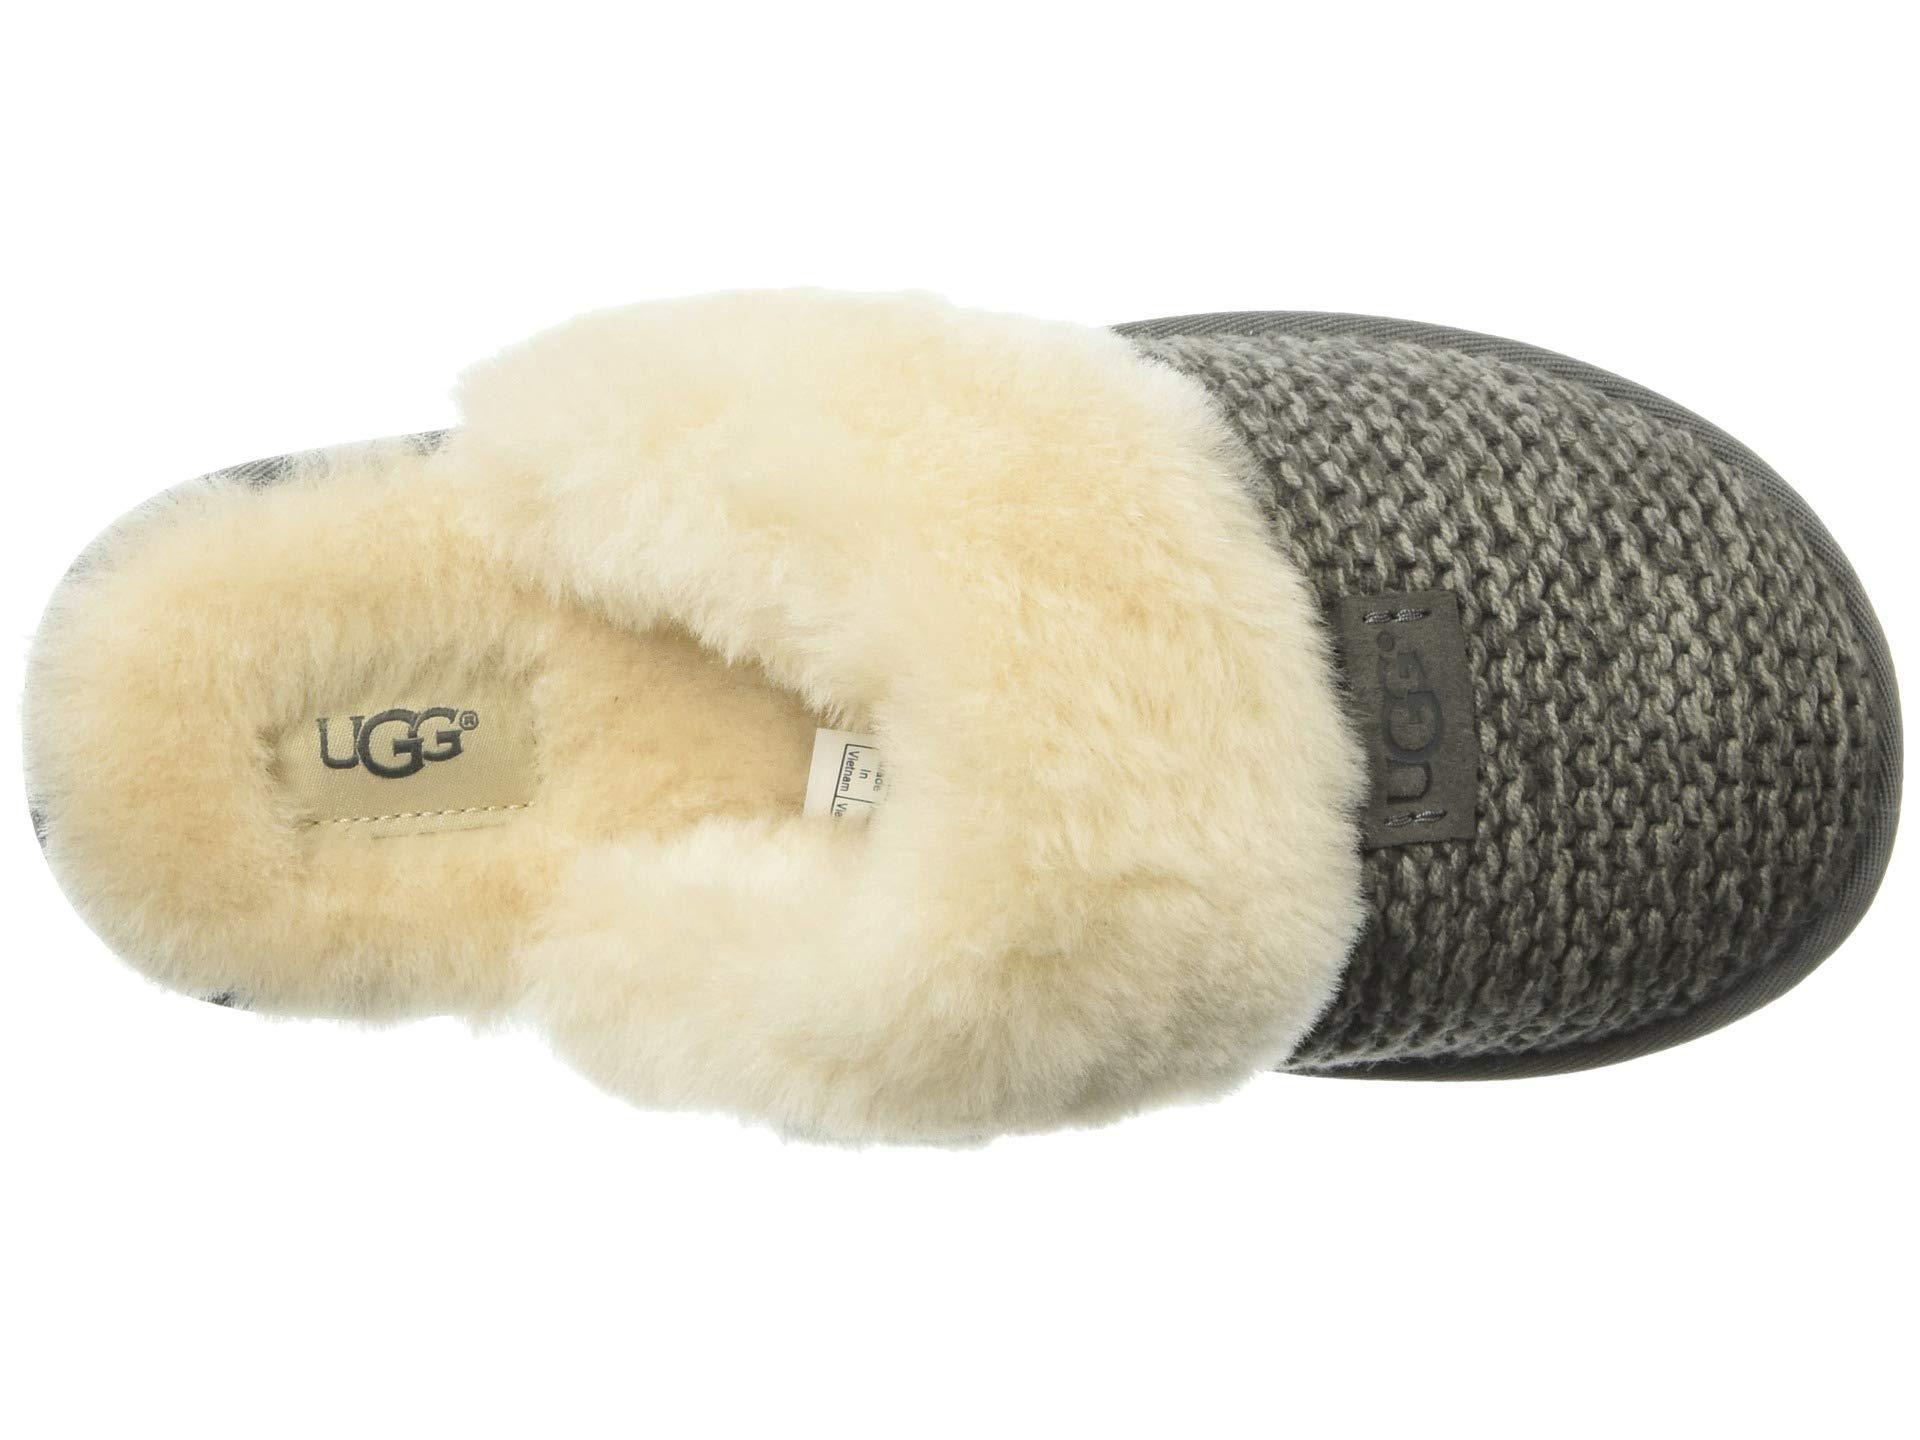 cdeb9d736f4 Ugg - Multicolor Cozy Knit Slipper (black) Women s Slippers - Lyst. View  fullscreen